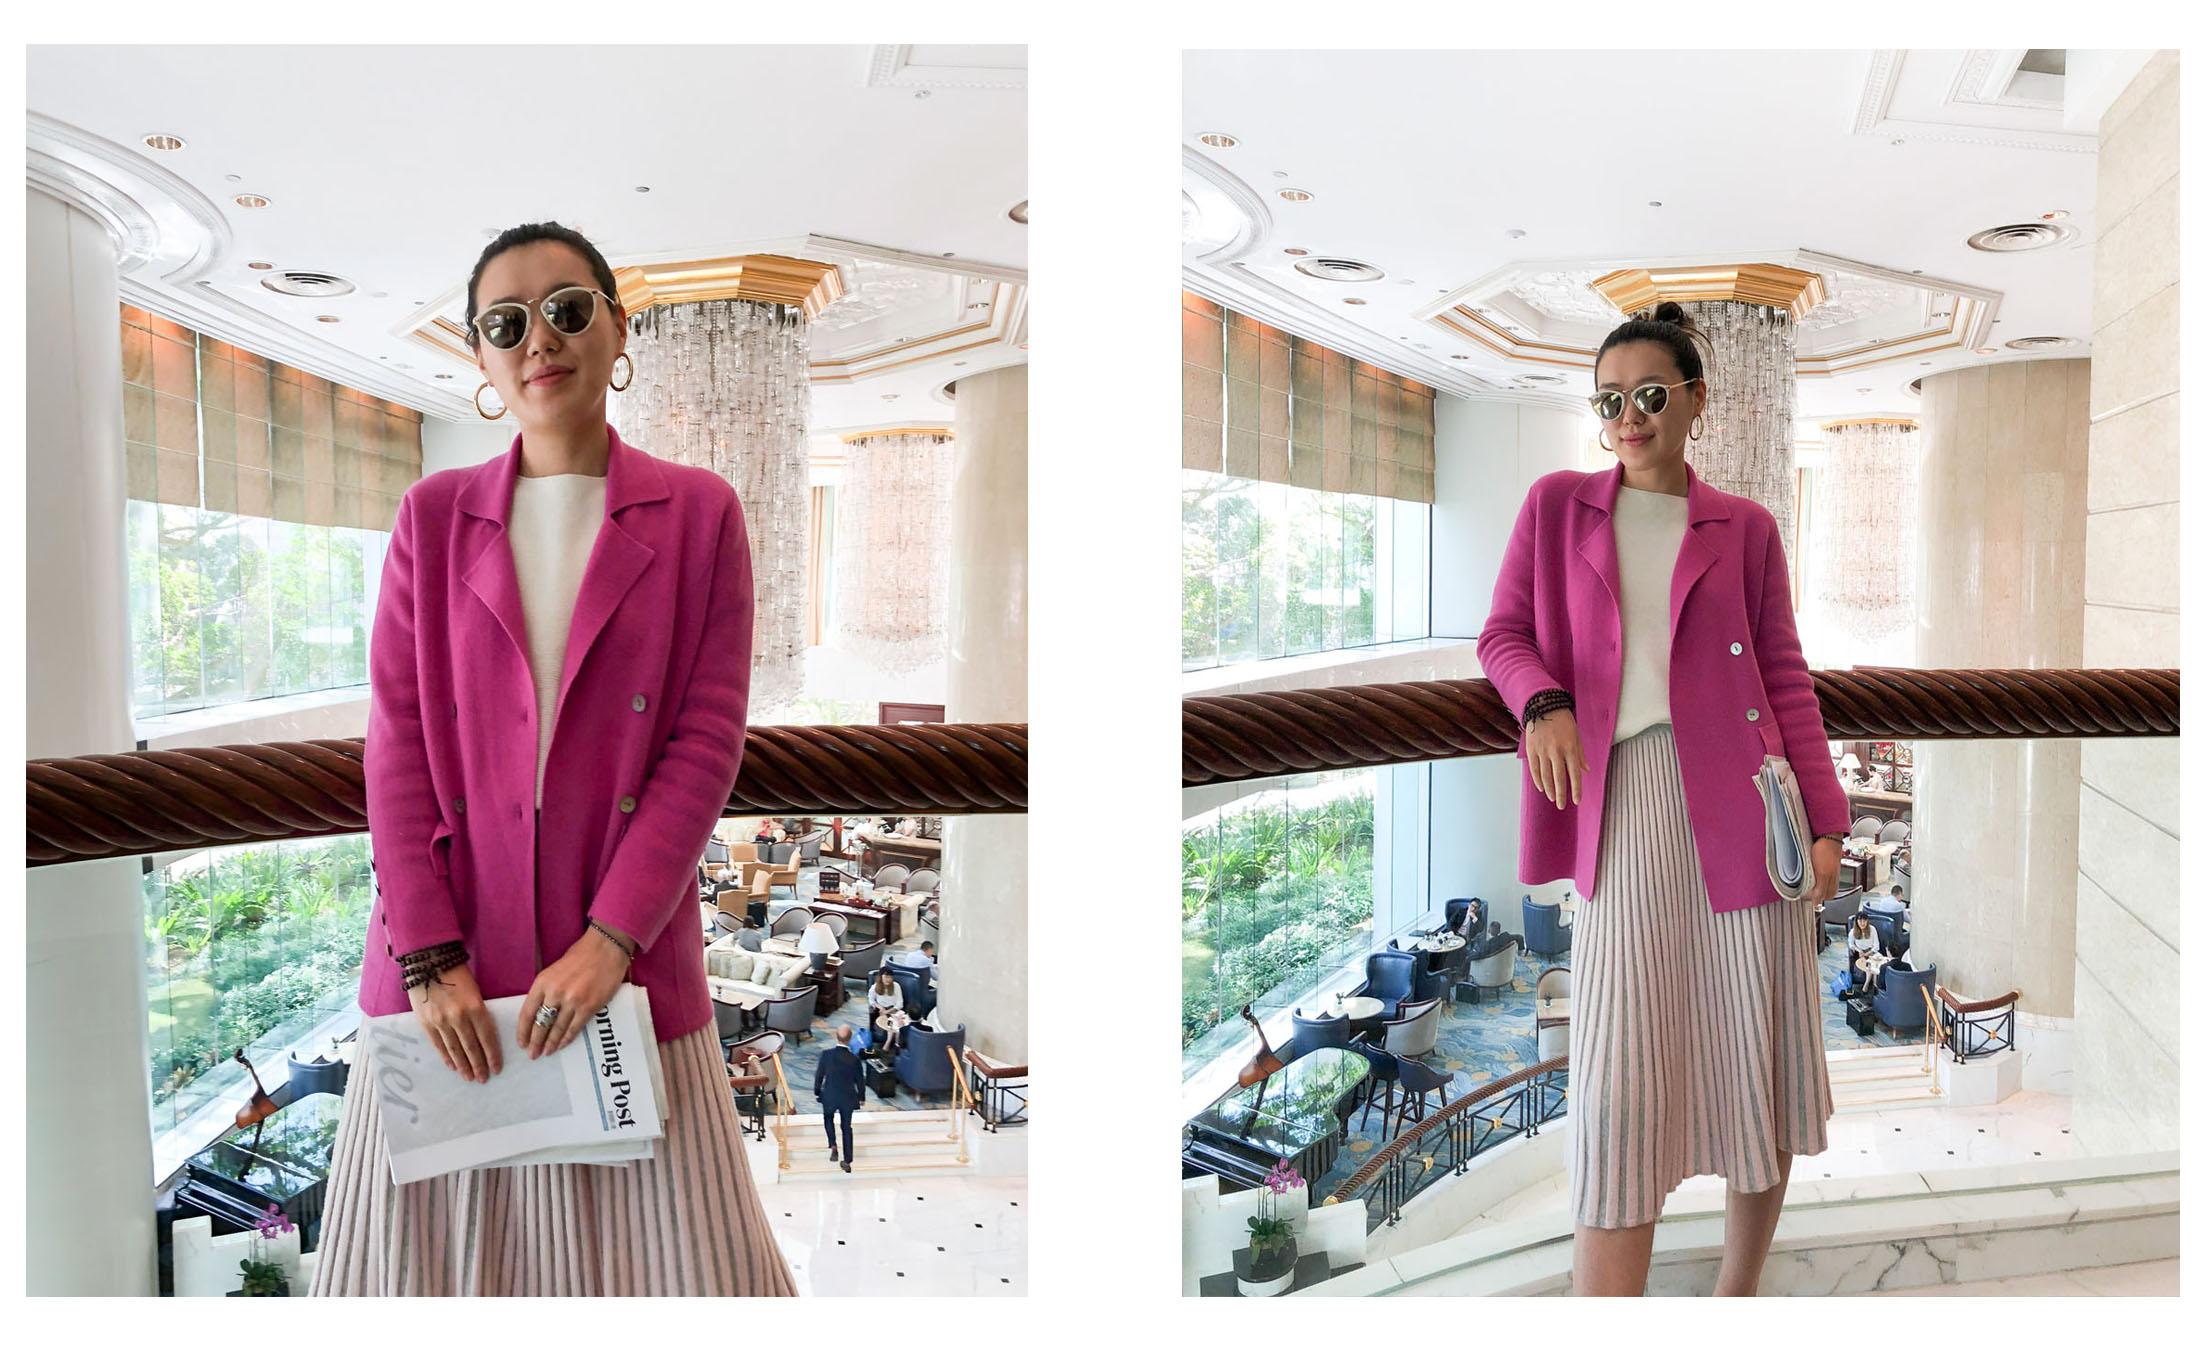 Mandkhai wears SS18 suit blazer in pink, SS17 skirt